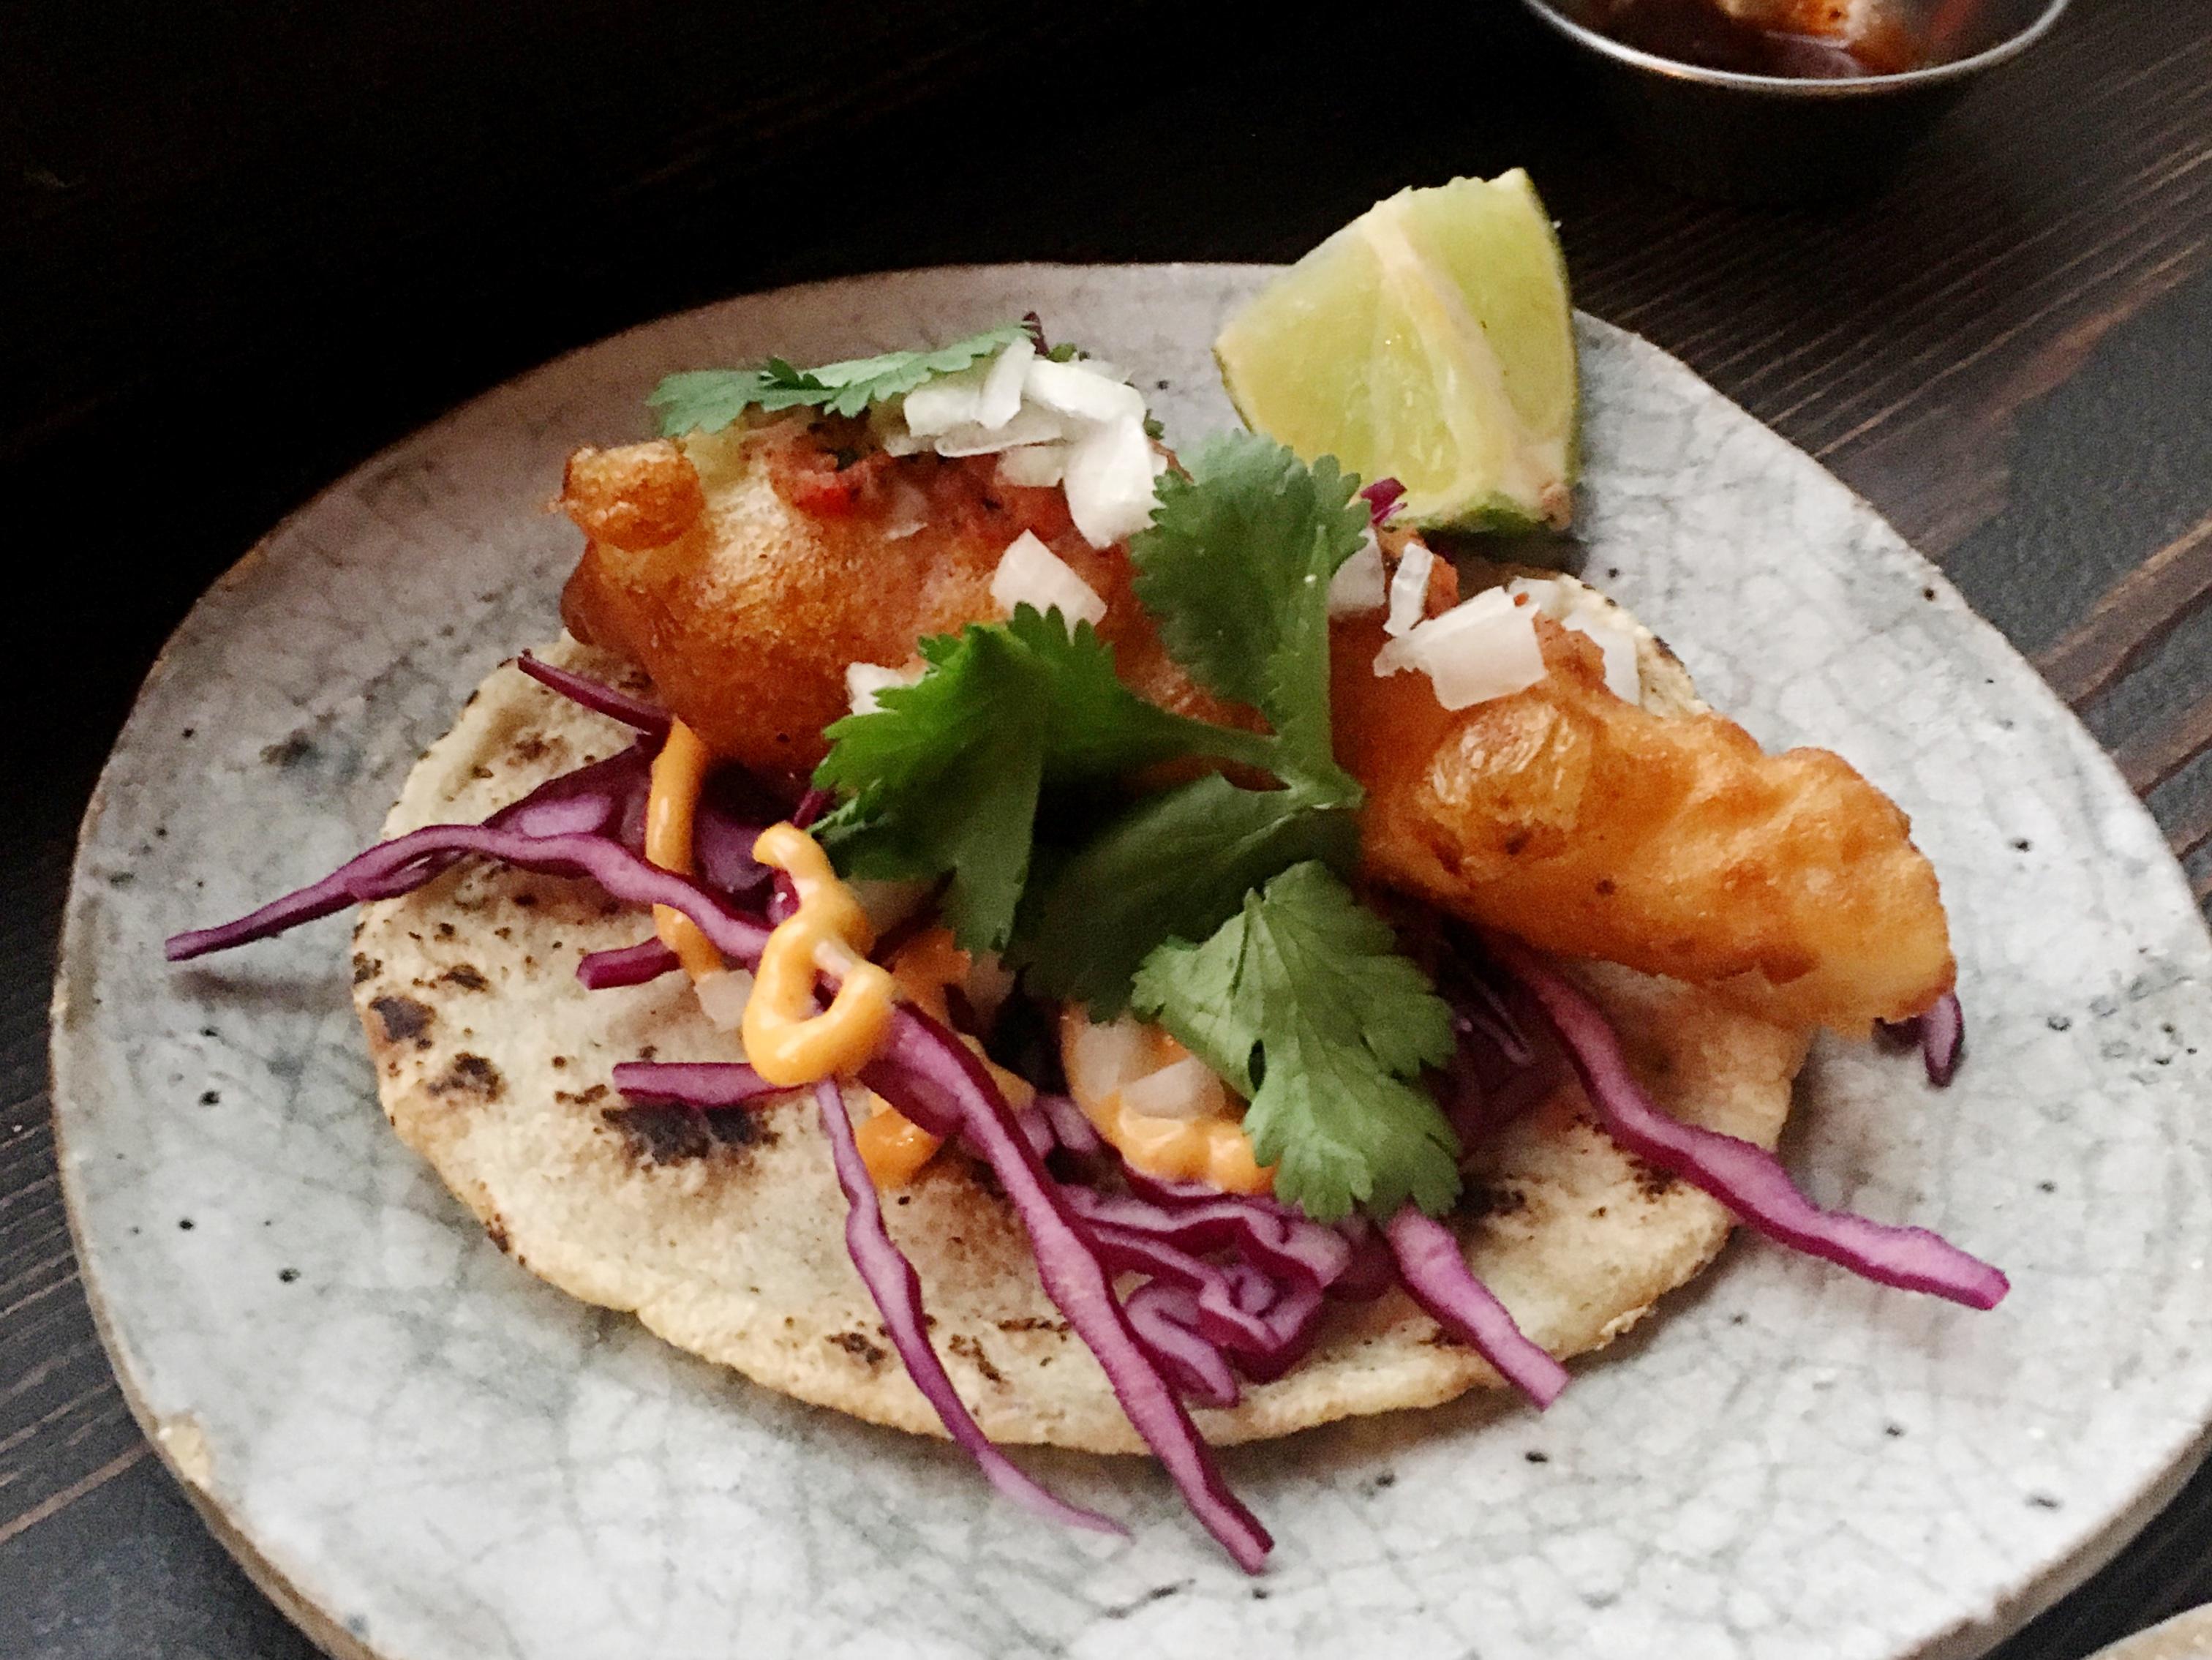 Breddos Tacos fish taco